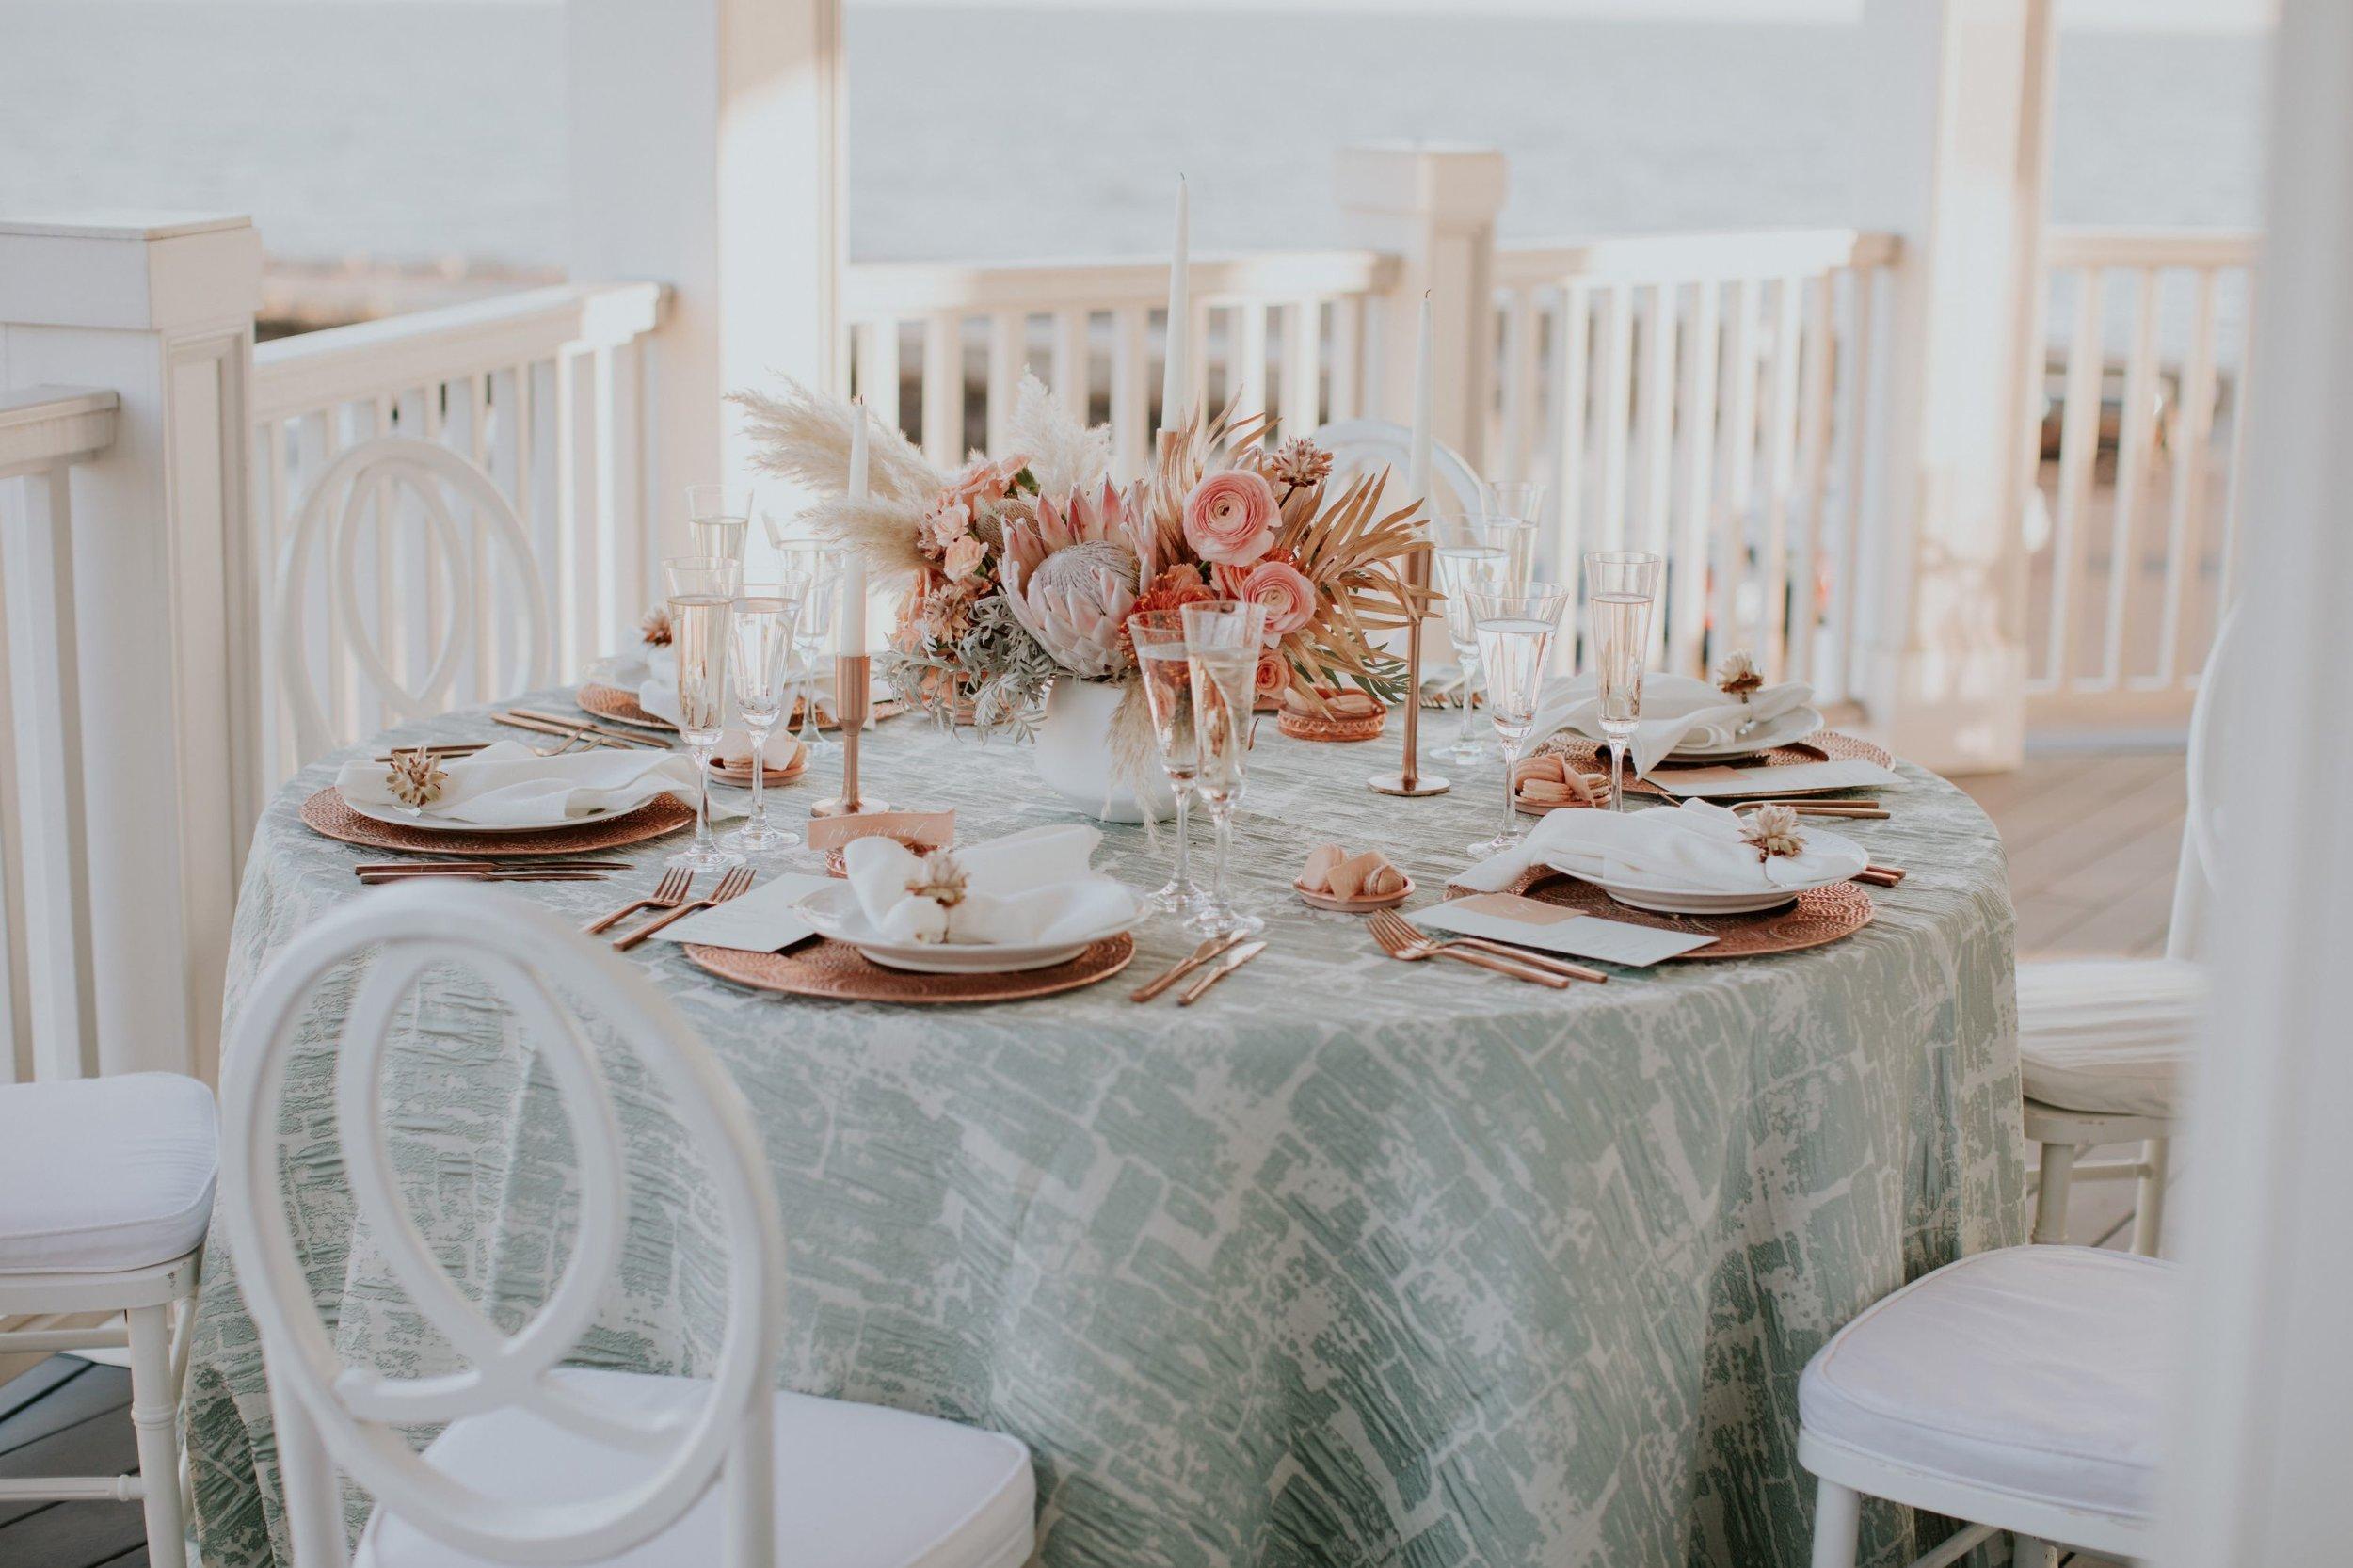 madison-beach-hotel-coastal-rose-gold-daylynn-designs-107.jpg